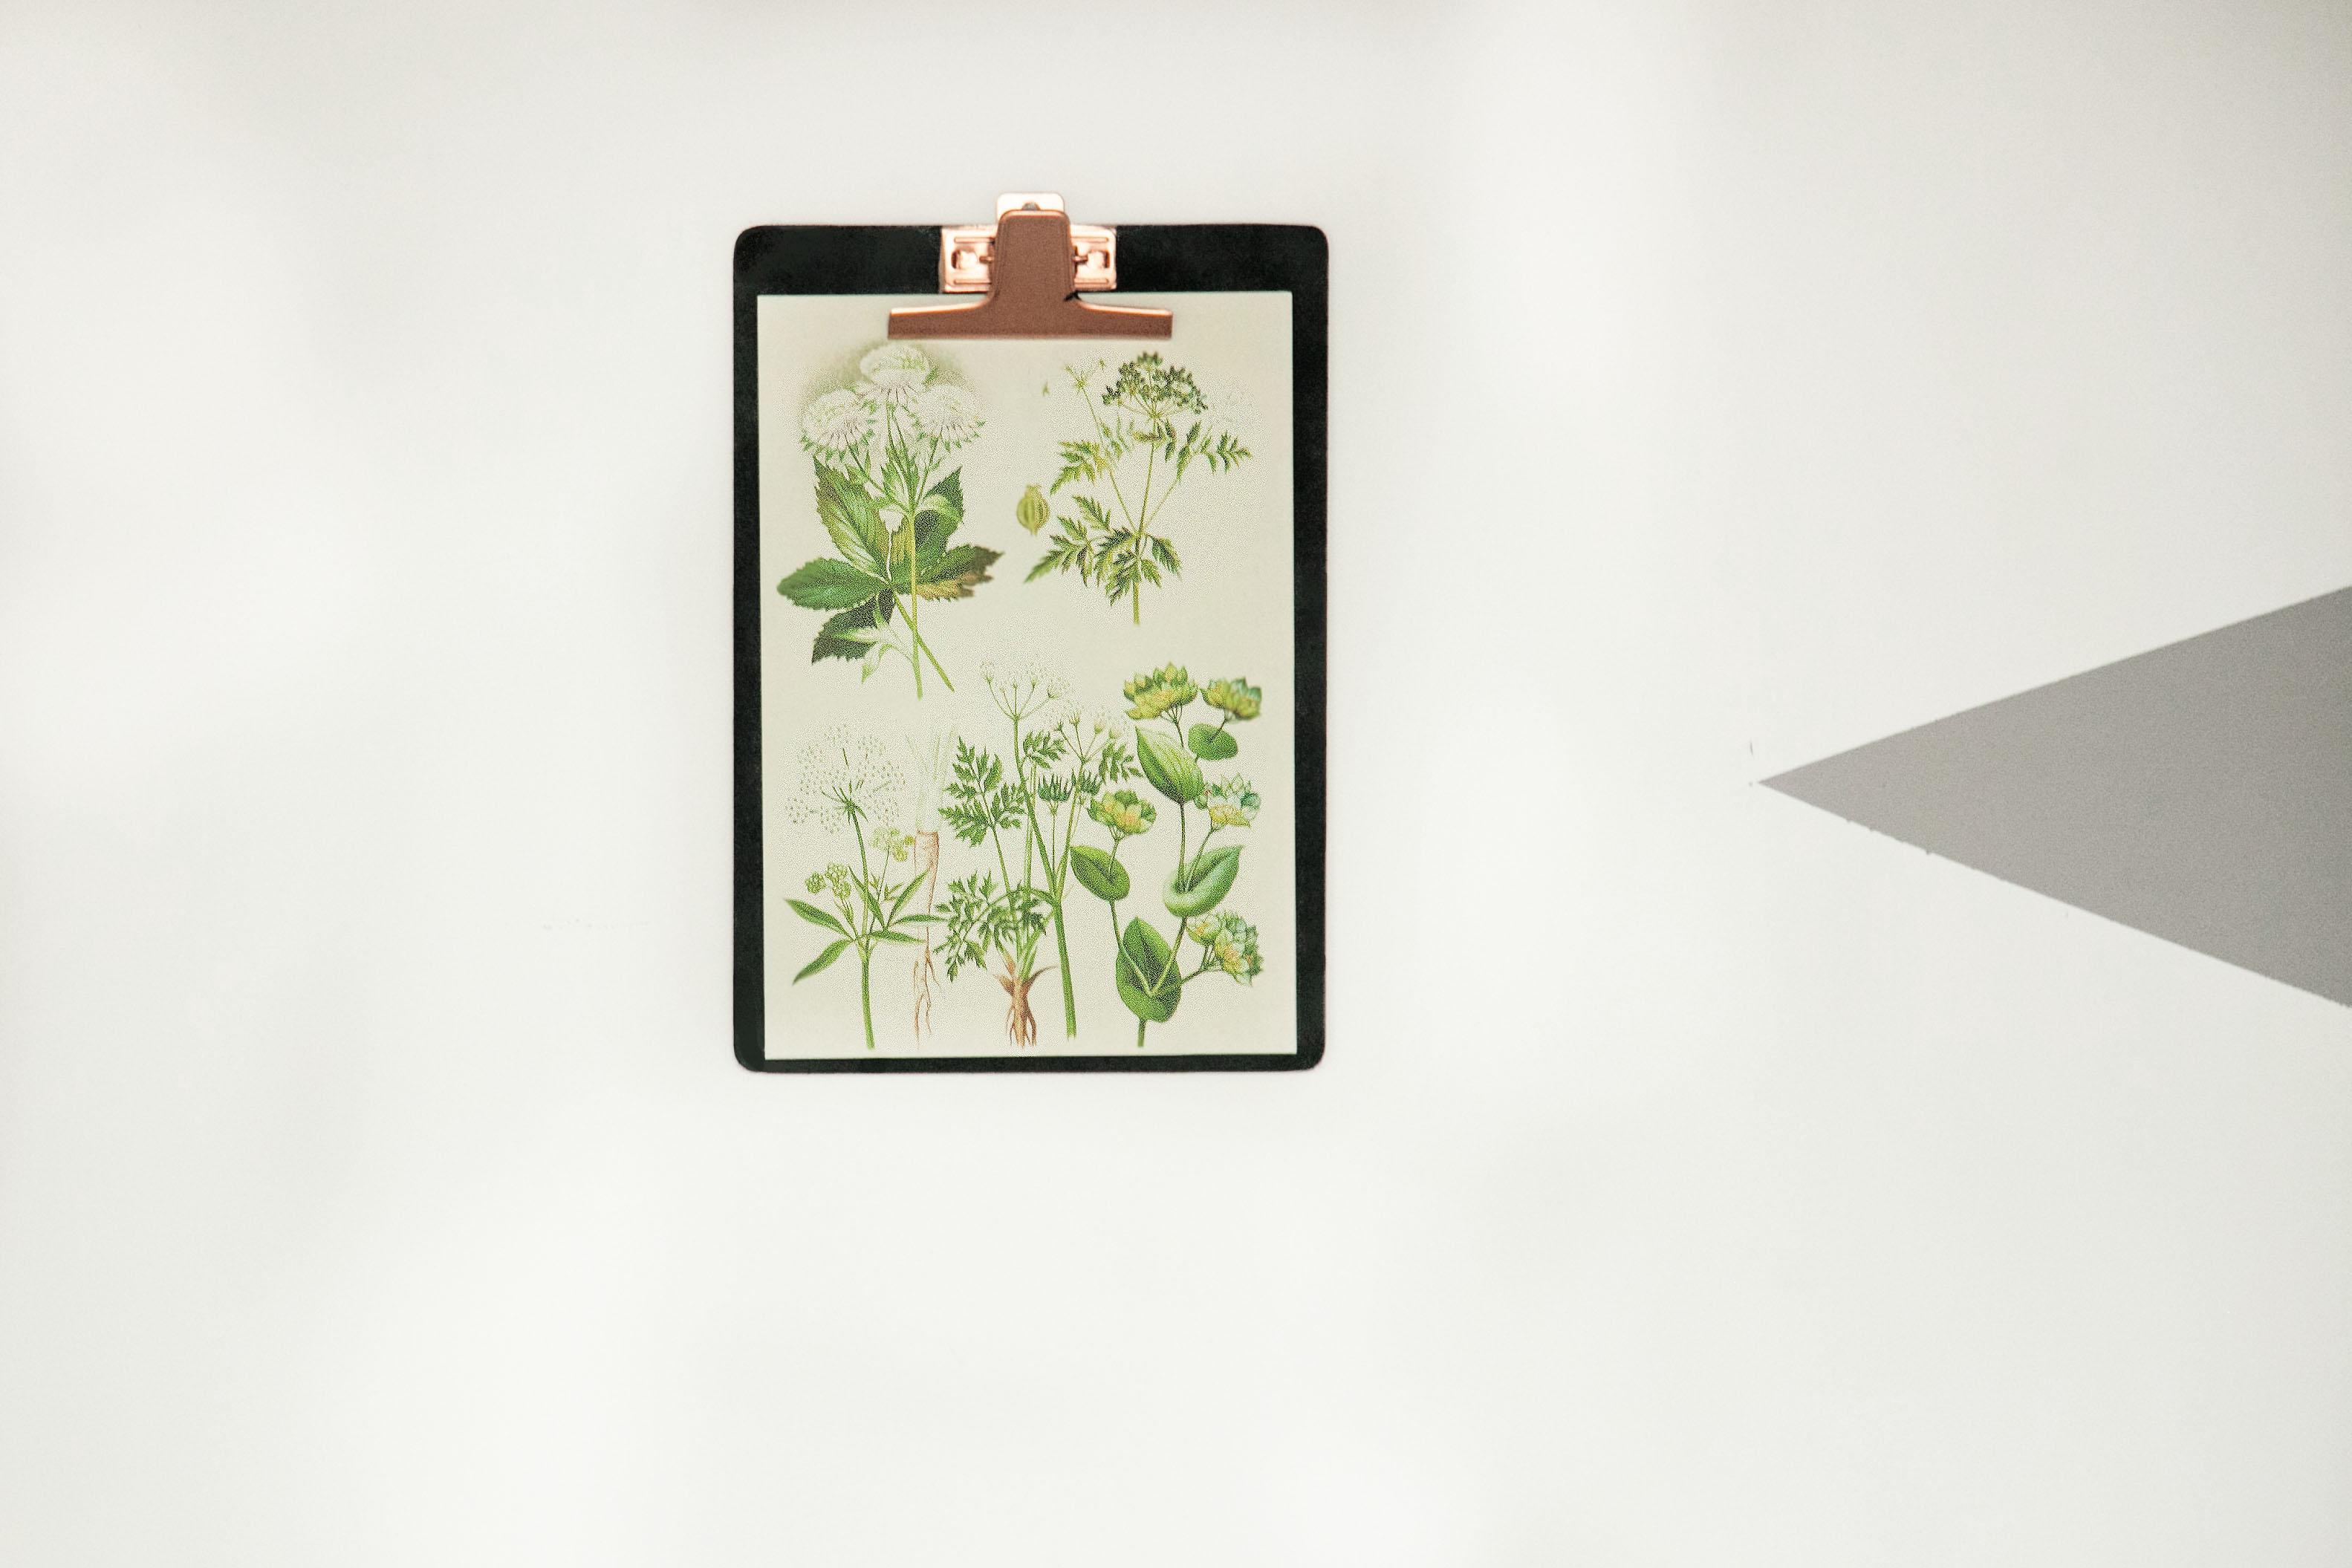 poster senza cornice clipboard